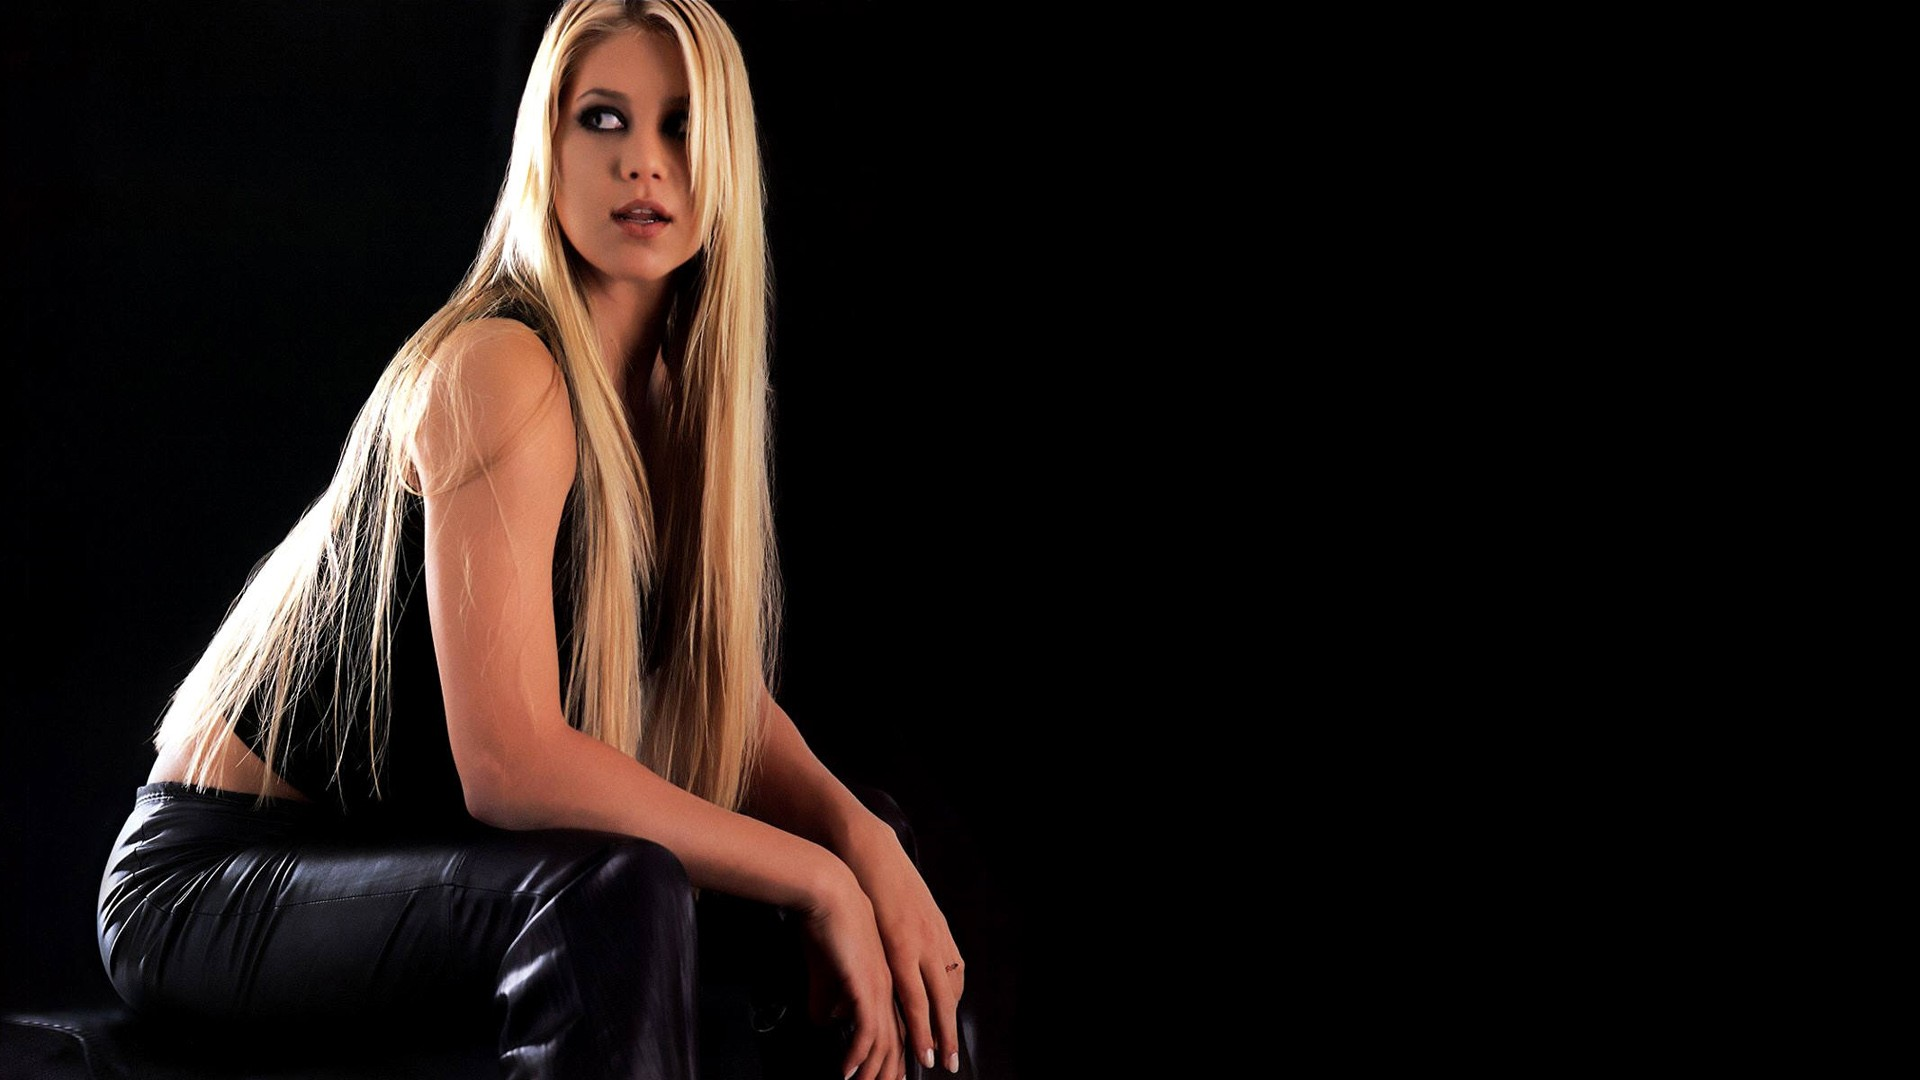 Anna Kournikova HD Wallpaper Background Image 1920x1080 ID 1920x1080